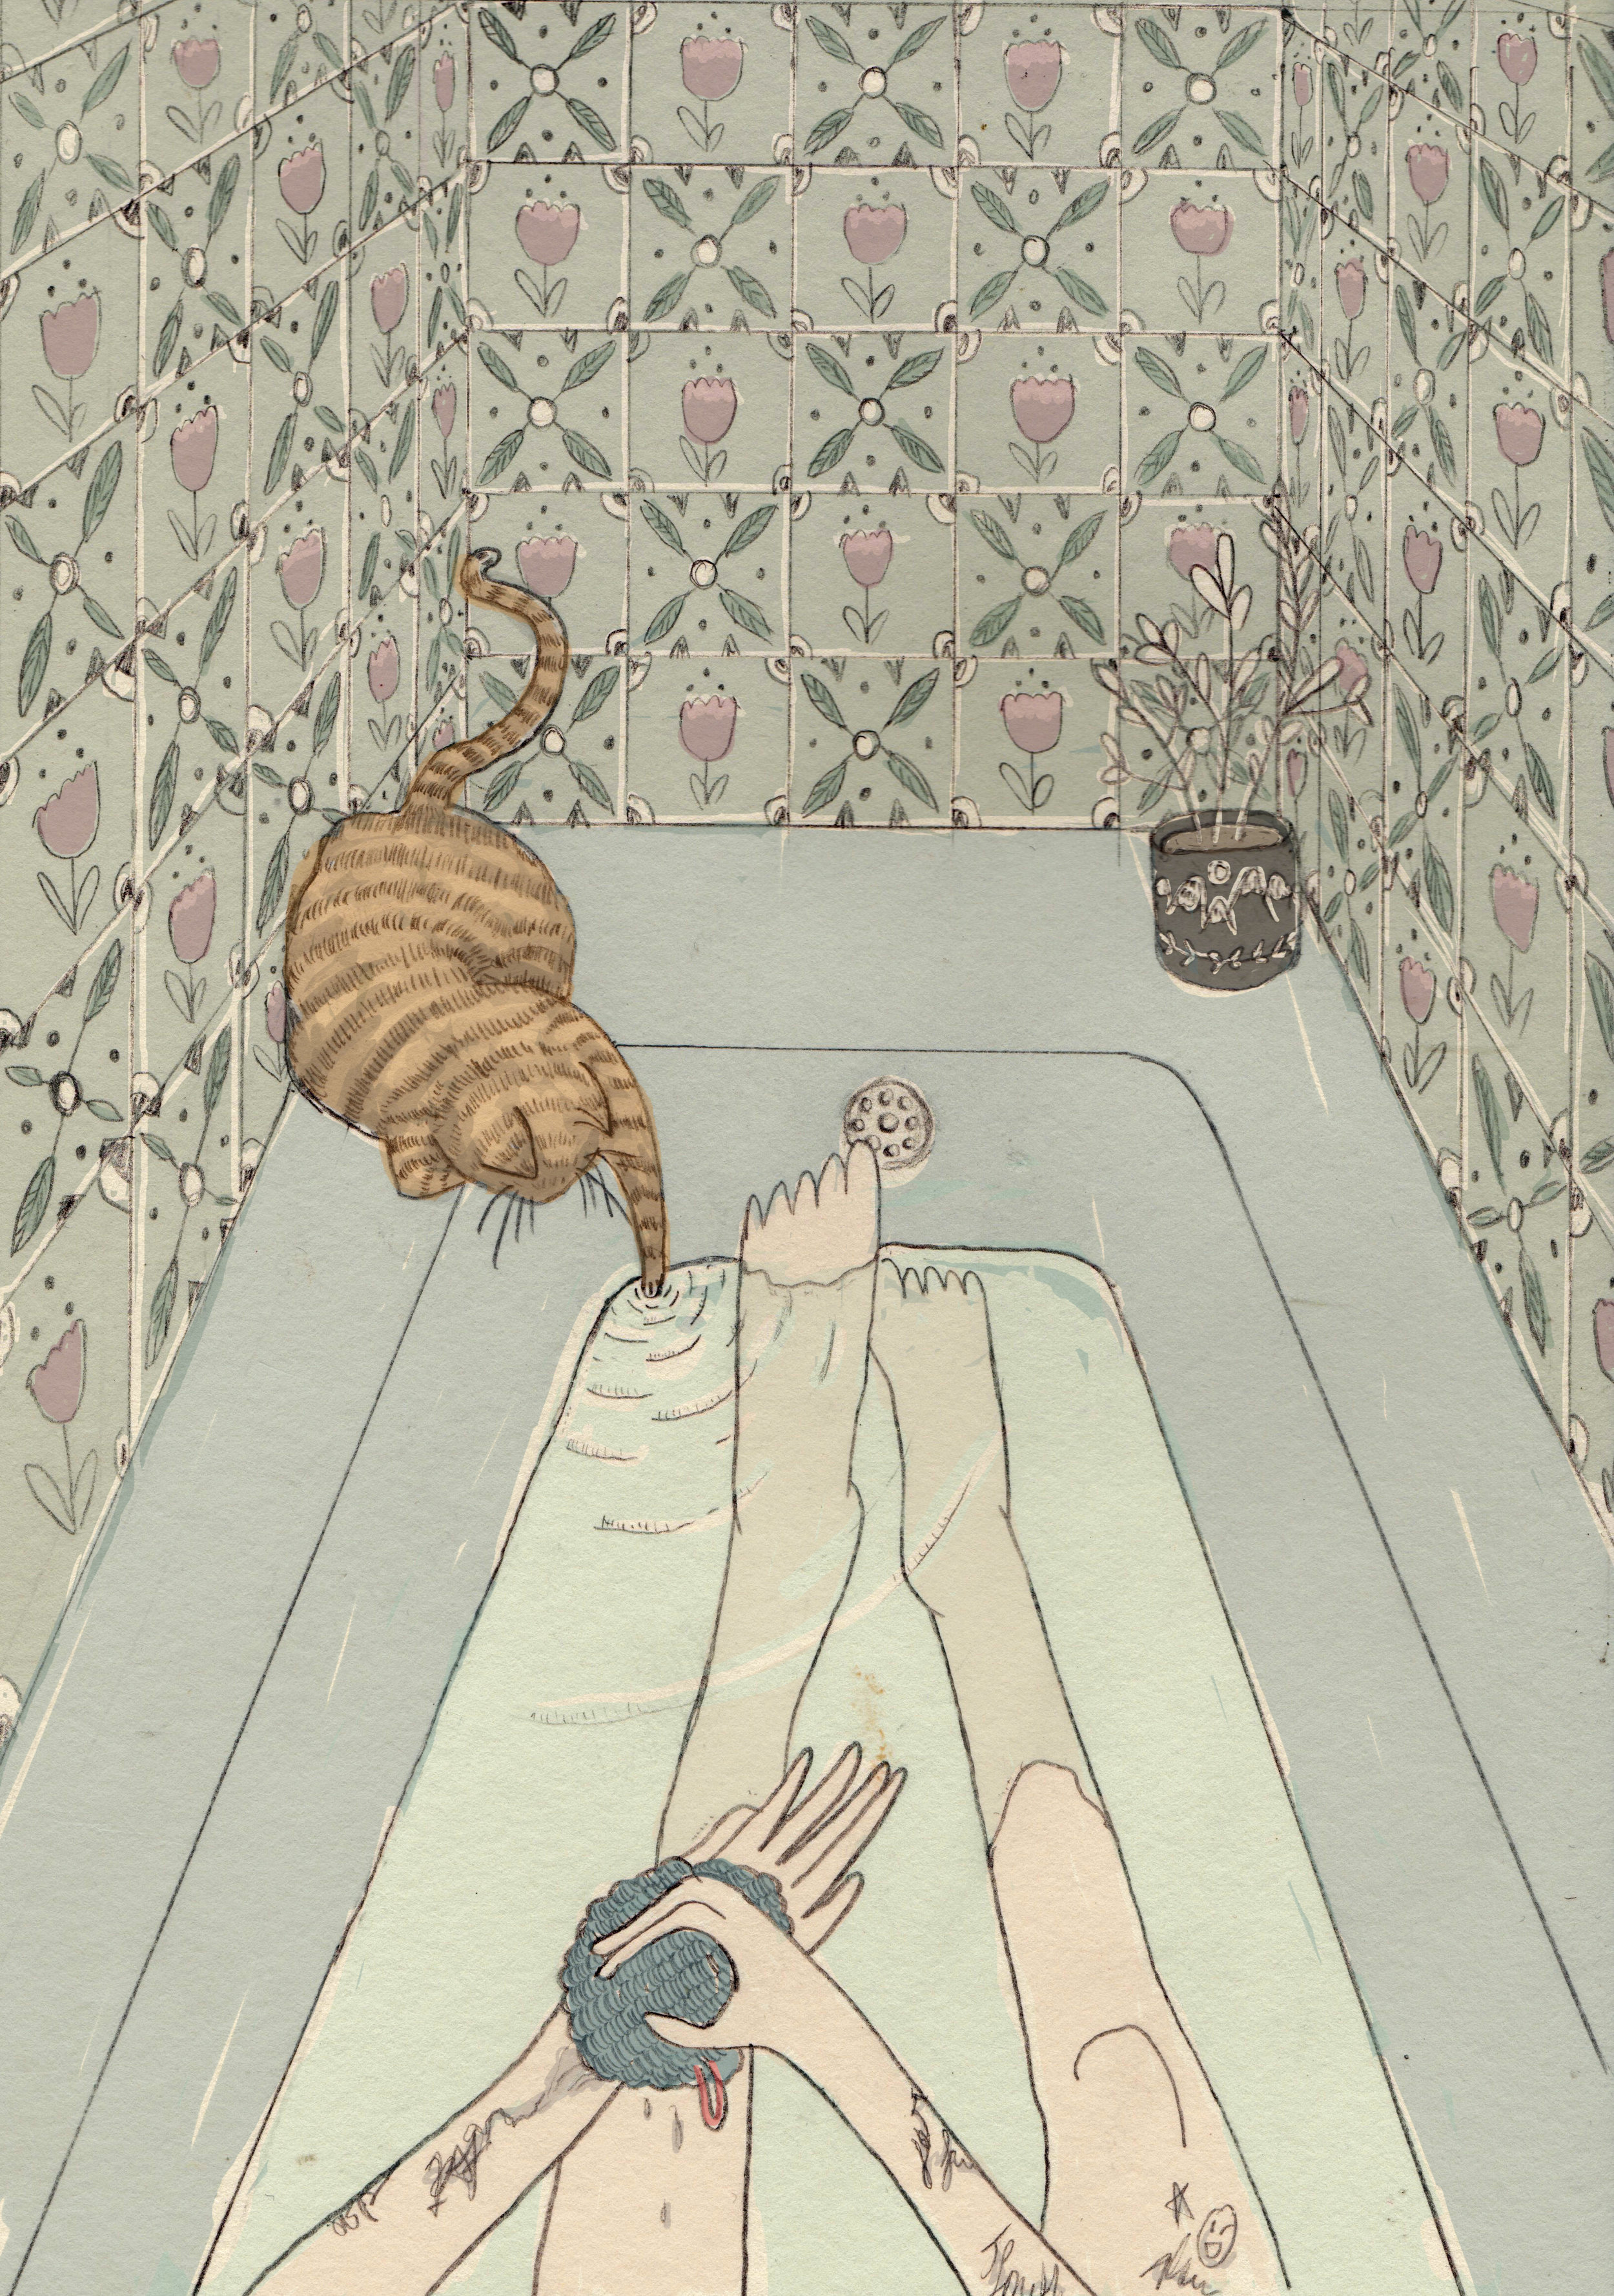 Bath_and_cat _fin1.jpg